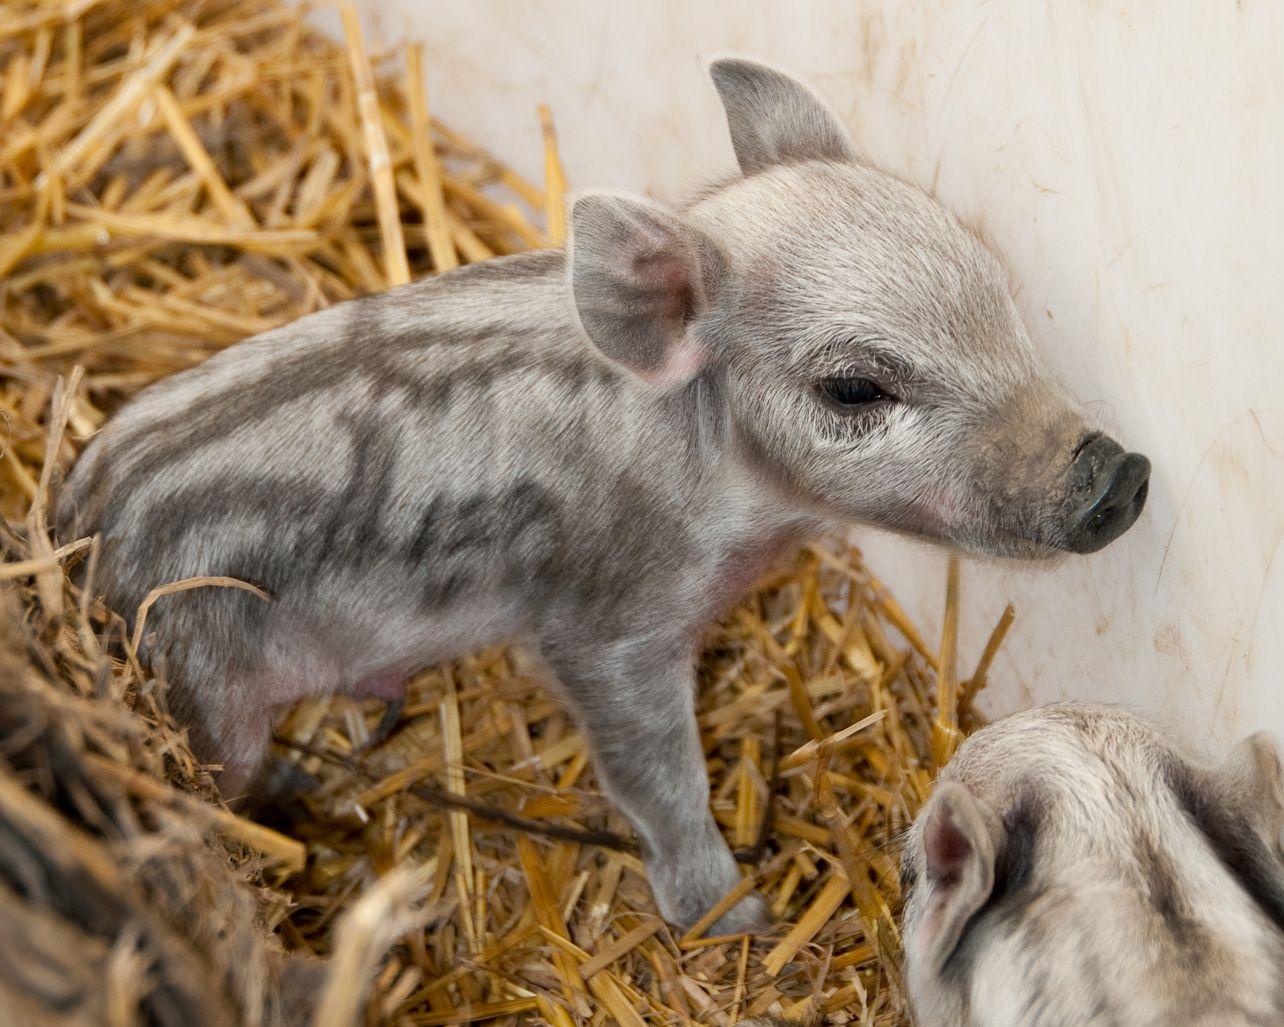 Cute Piglets Wallpaper Mangalitsa Piglets Cute Pigs Cute Piggies Baby Animals